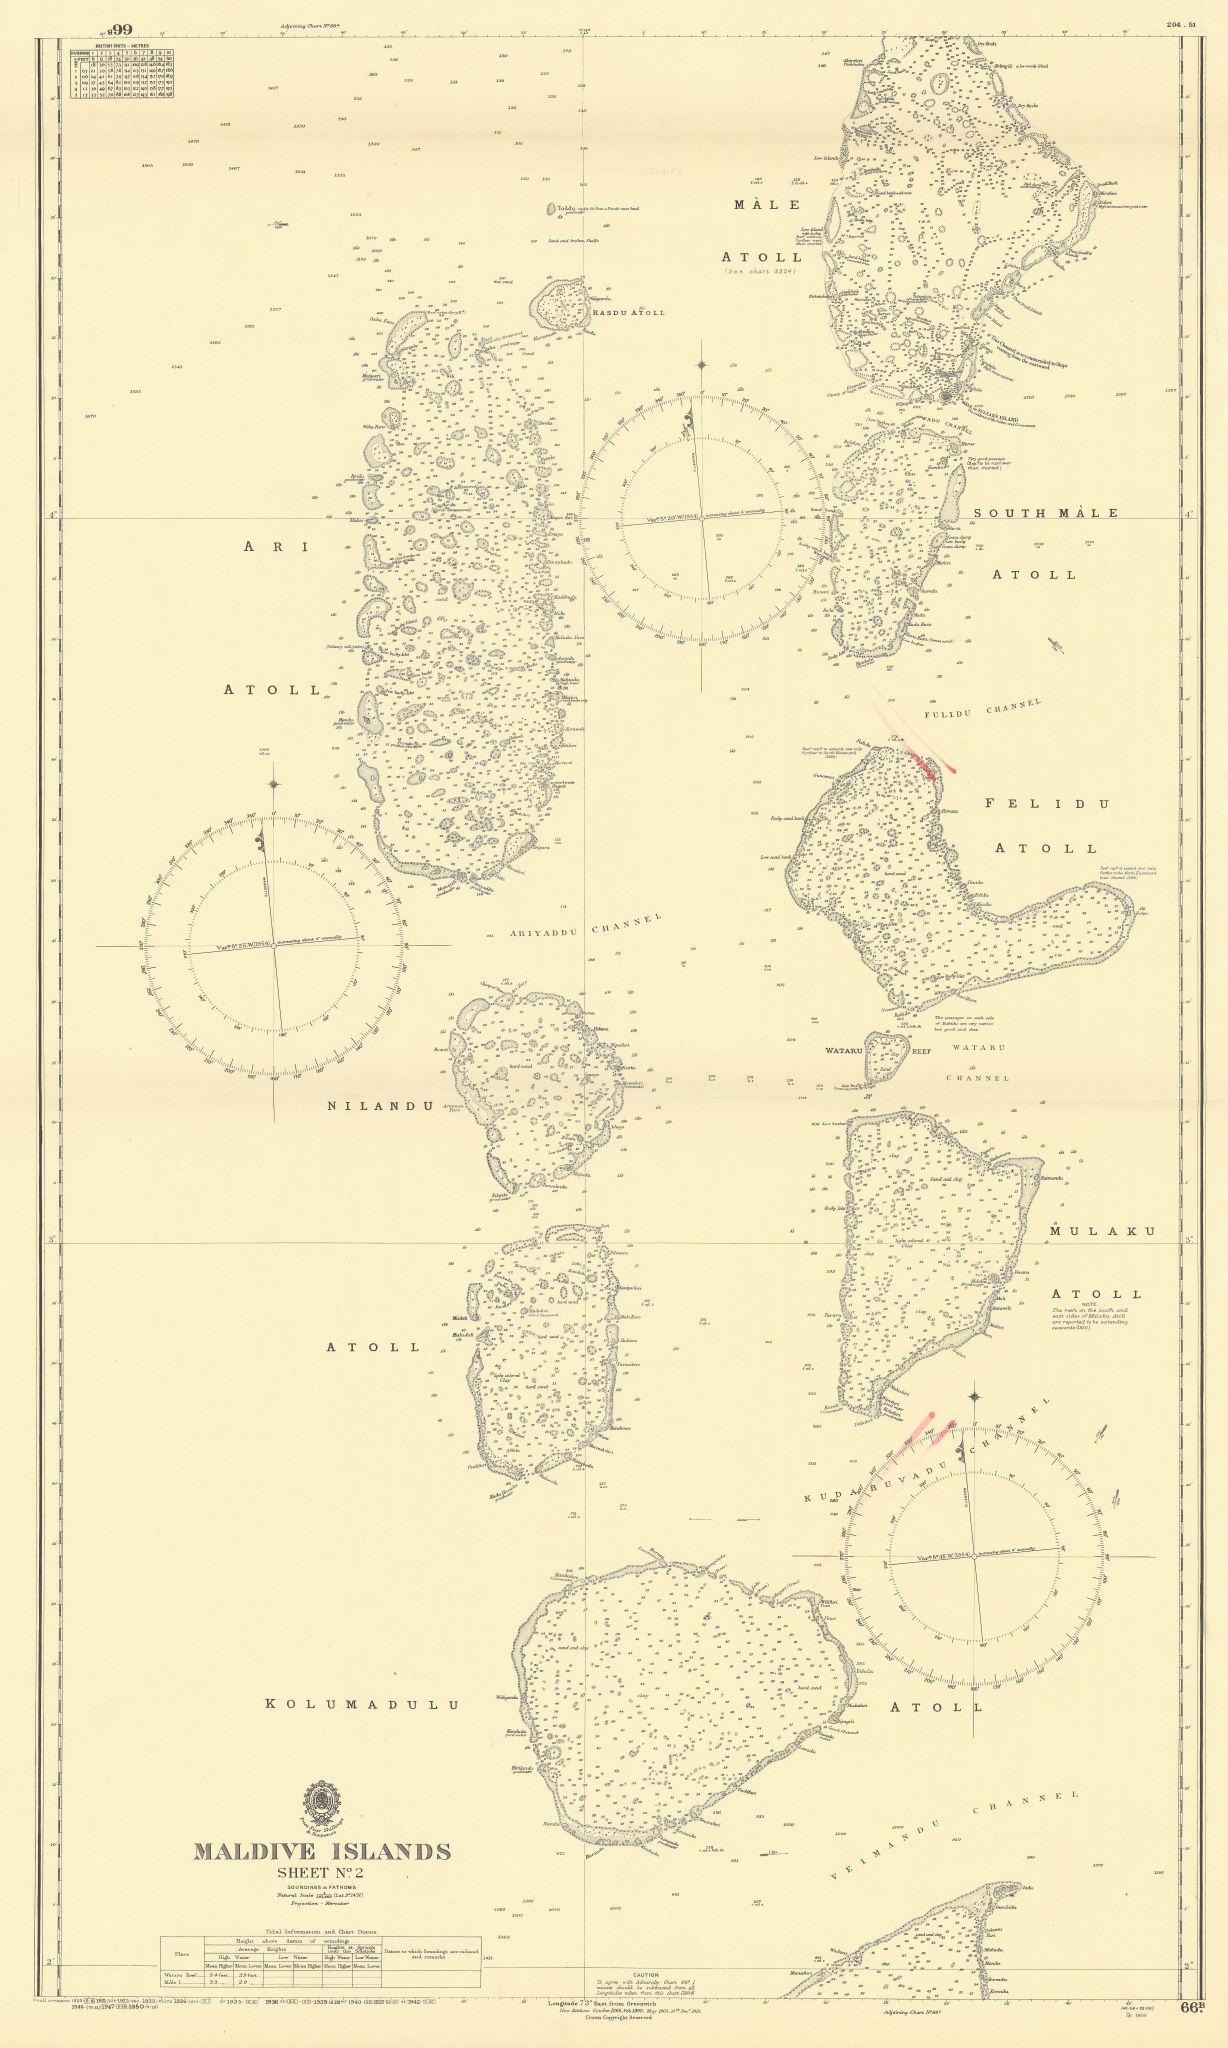 Maldive Islands #2 Centre Walker/EAST INDIA COMPANY sea chart 1839 (1950) map